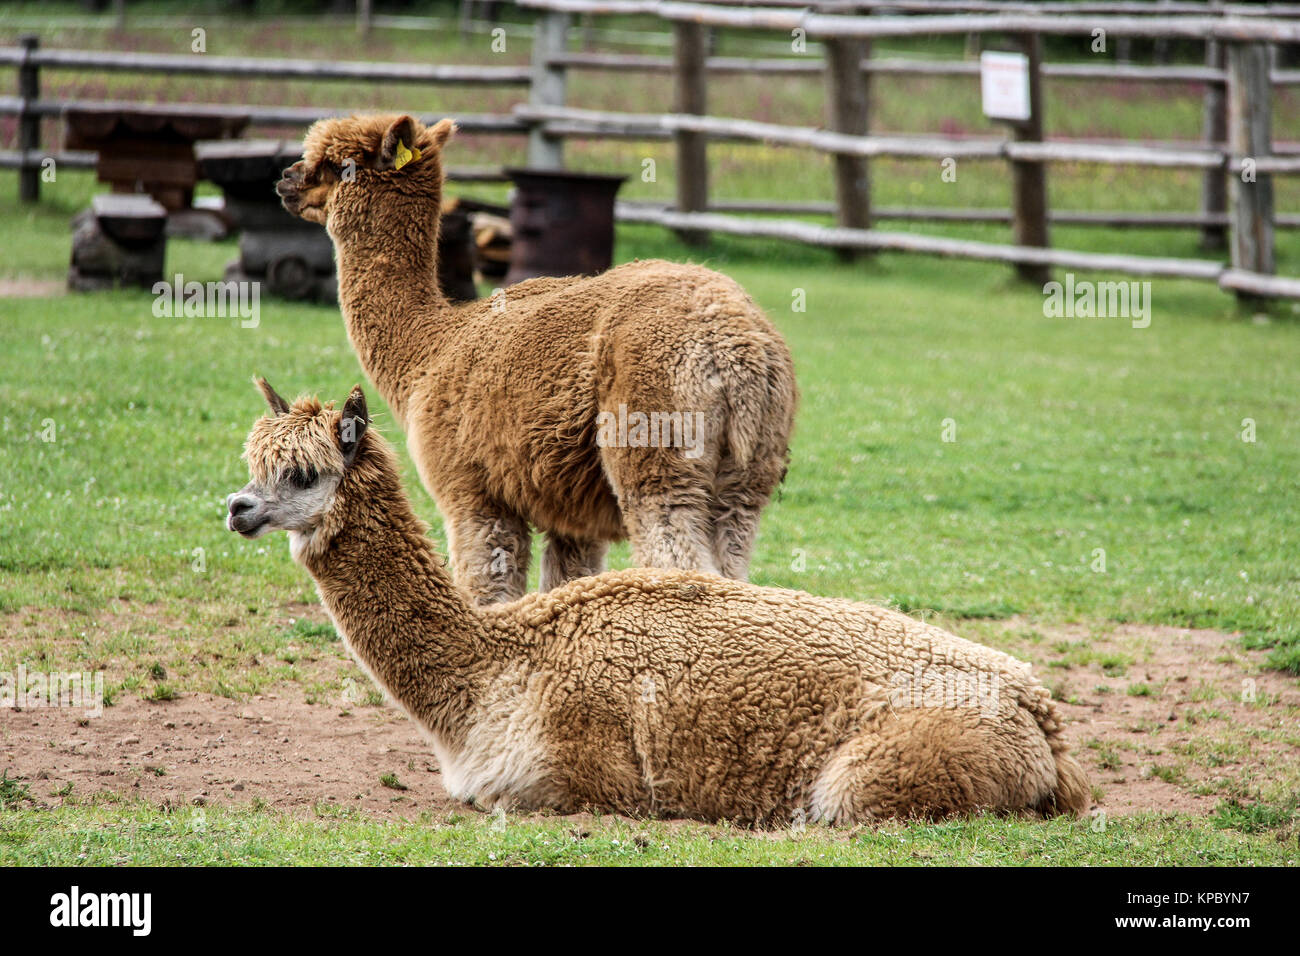 Funny Alpaca Stock Photos Funny Alpaca Stock Images Alamy - 22 hilarious alpaca hairstyles